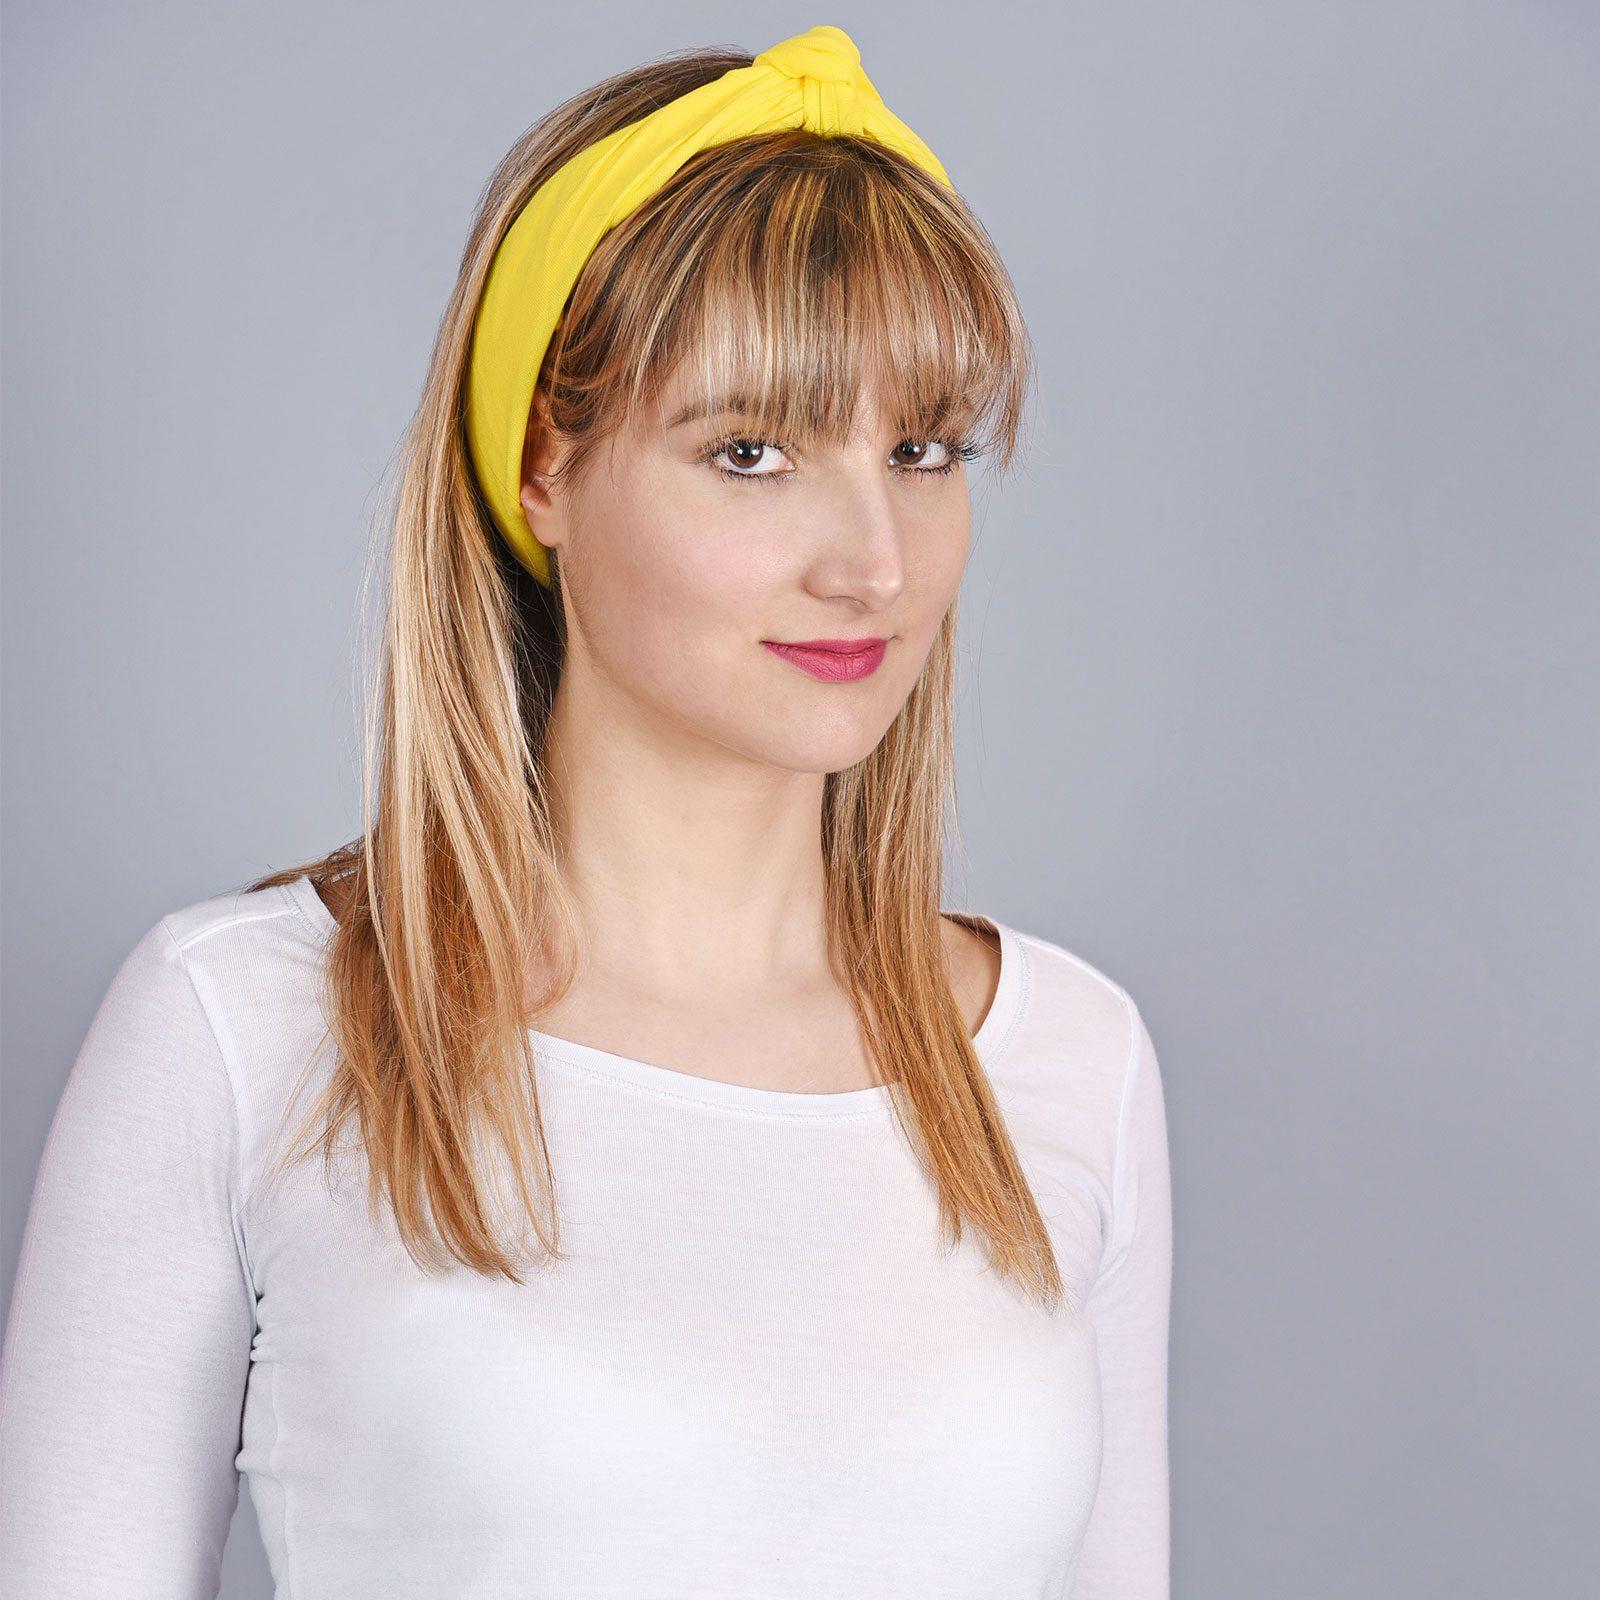 http://lookbook.allee-du-foulard.fr/wp-content/uploads/2018/06/AT-04301-VF16-2-bandana-jaune-uni-1600x1600.jpg